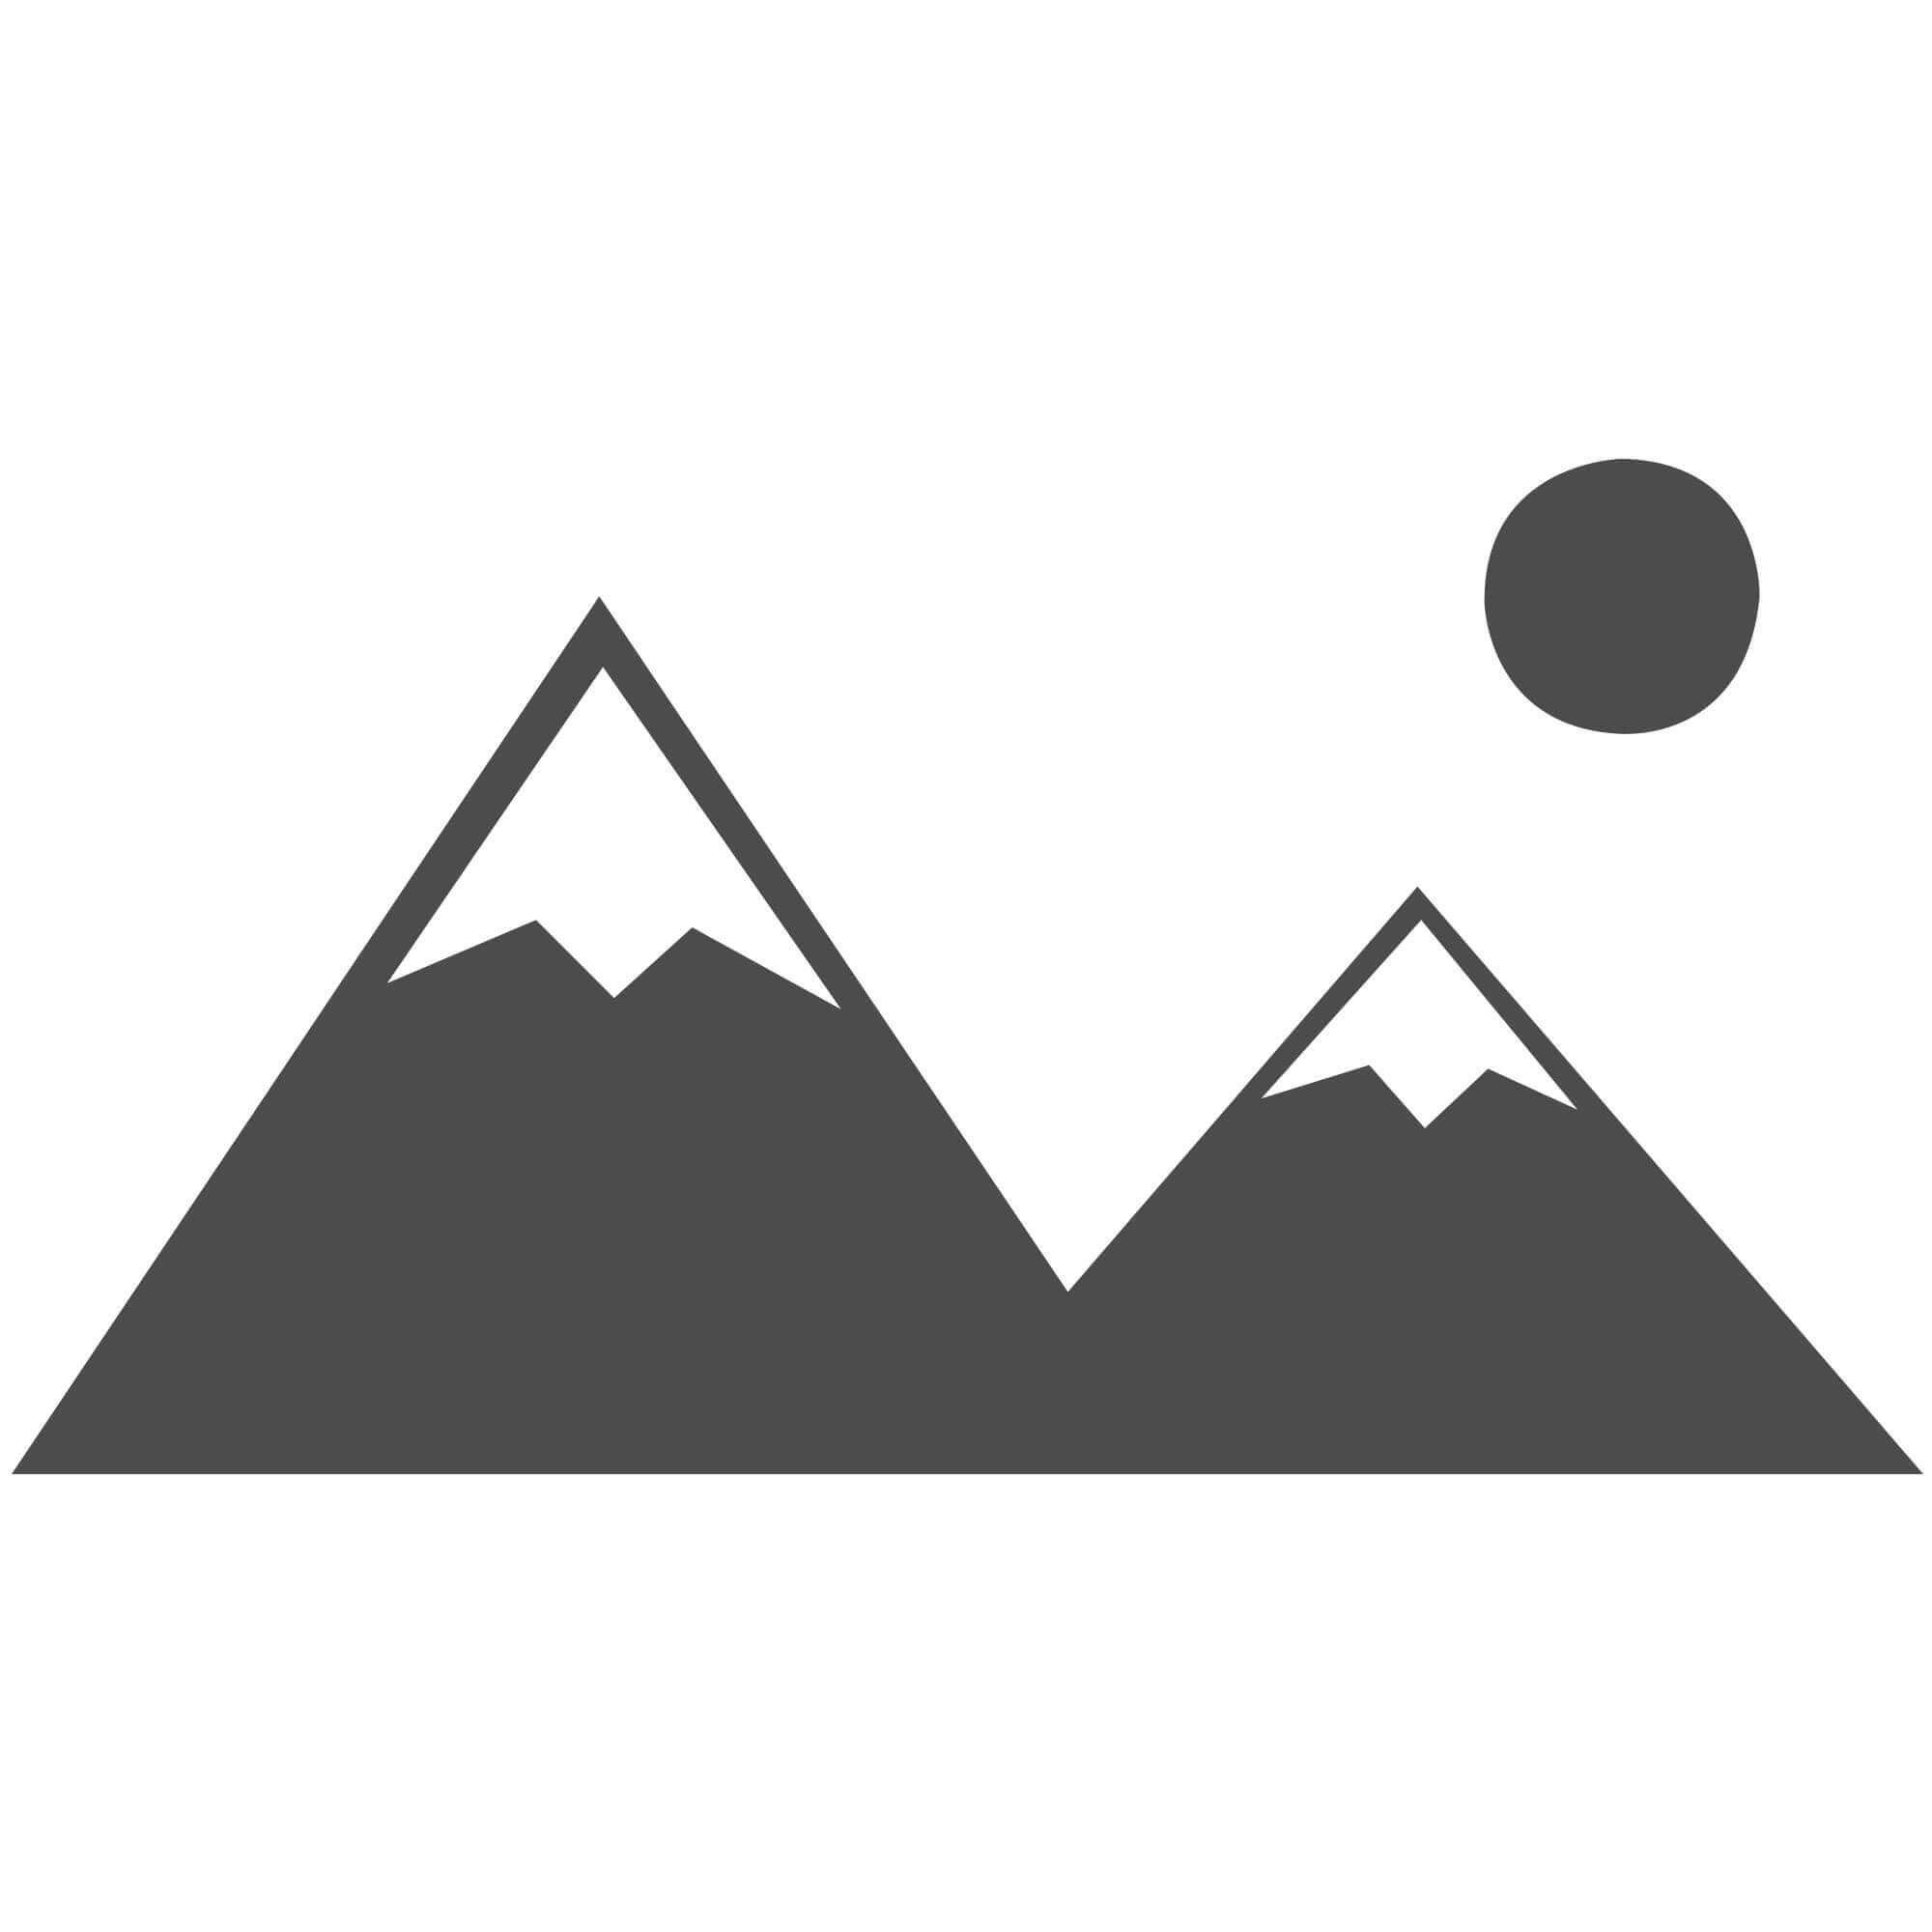 "Nordic Cariboo Shaggy Rug - Black - Size 160 x 230 cm (5'3"" x 7'7"")"